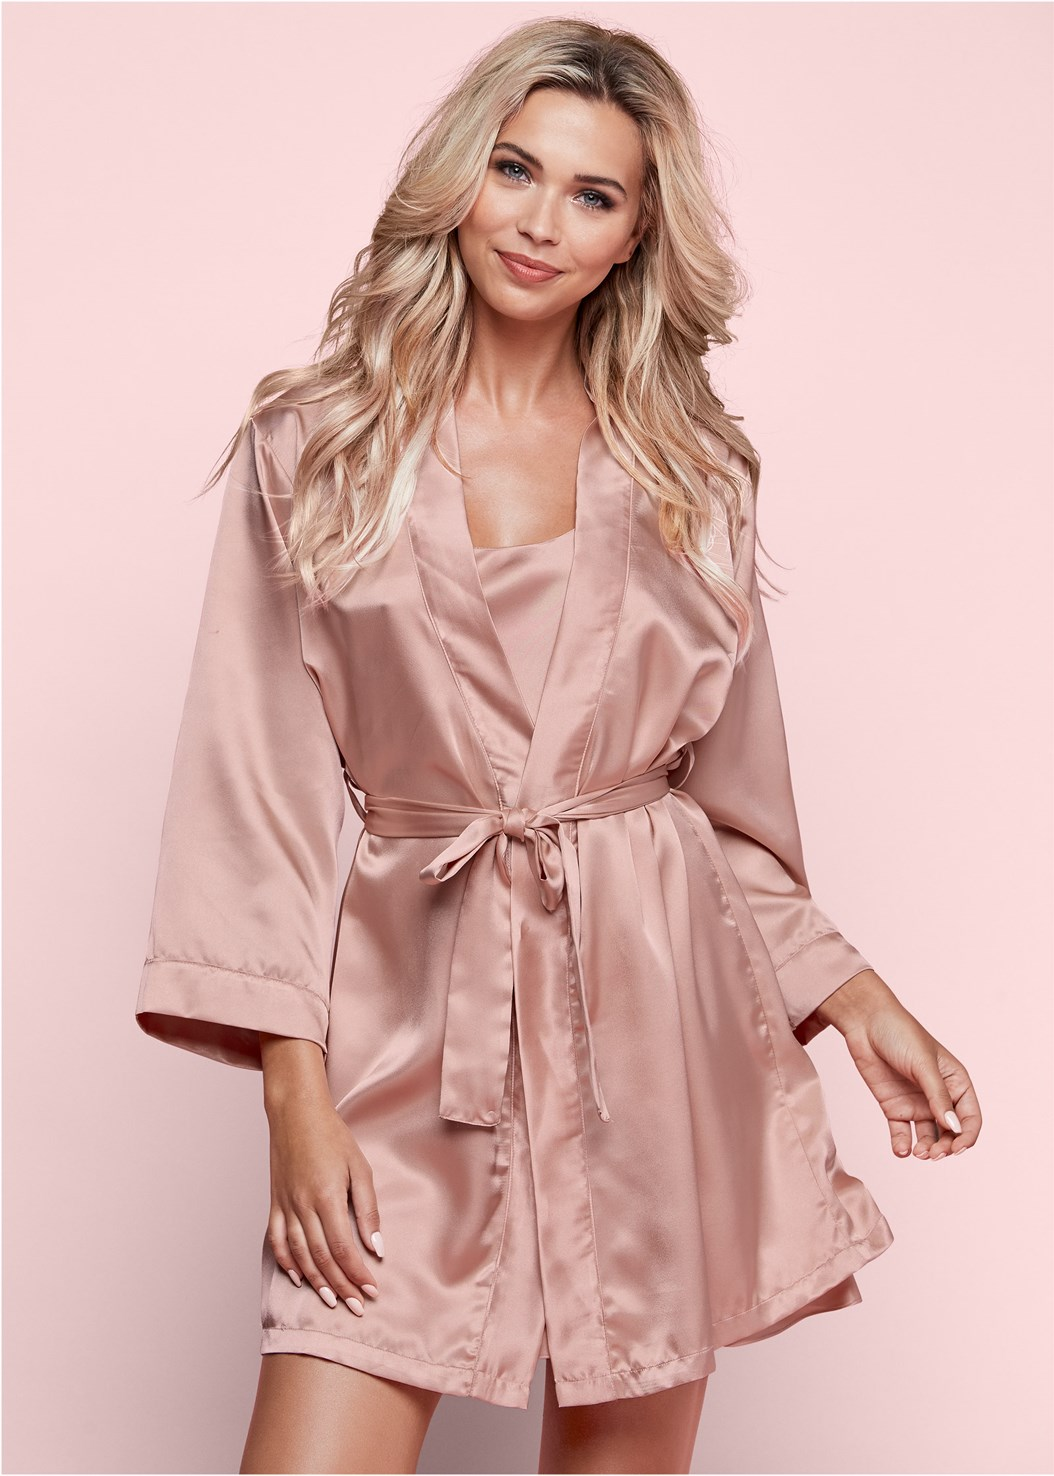 Luster Satin Robe,Luster Satin Slip,Embellished Strappy Heel